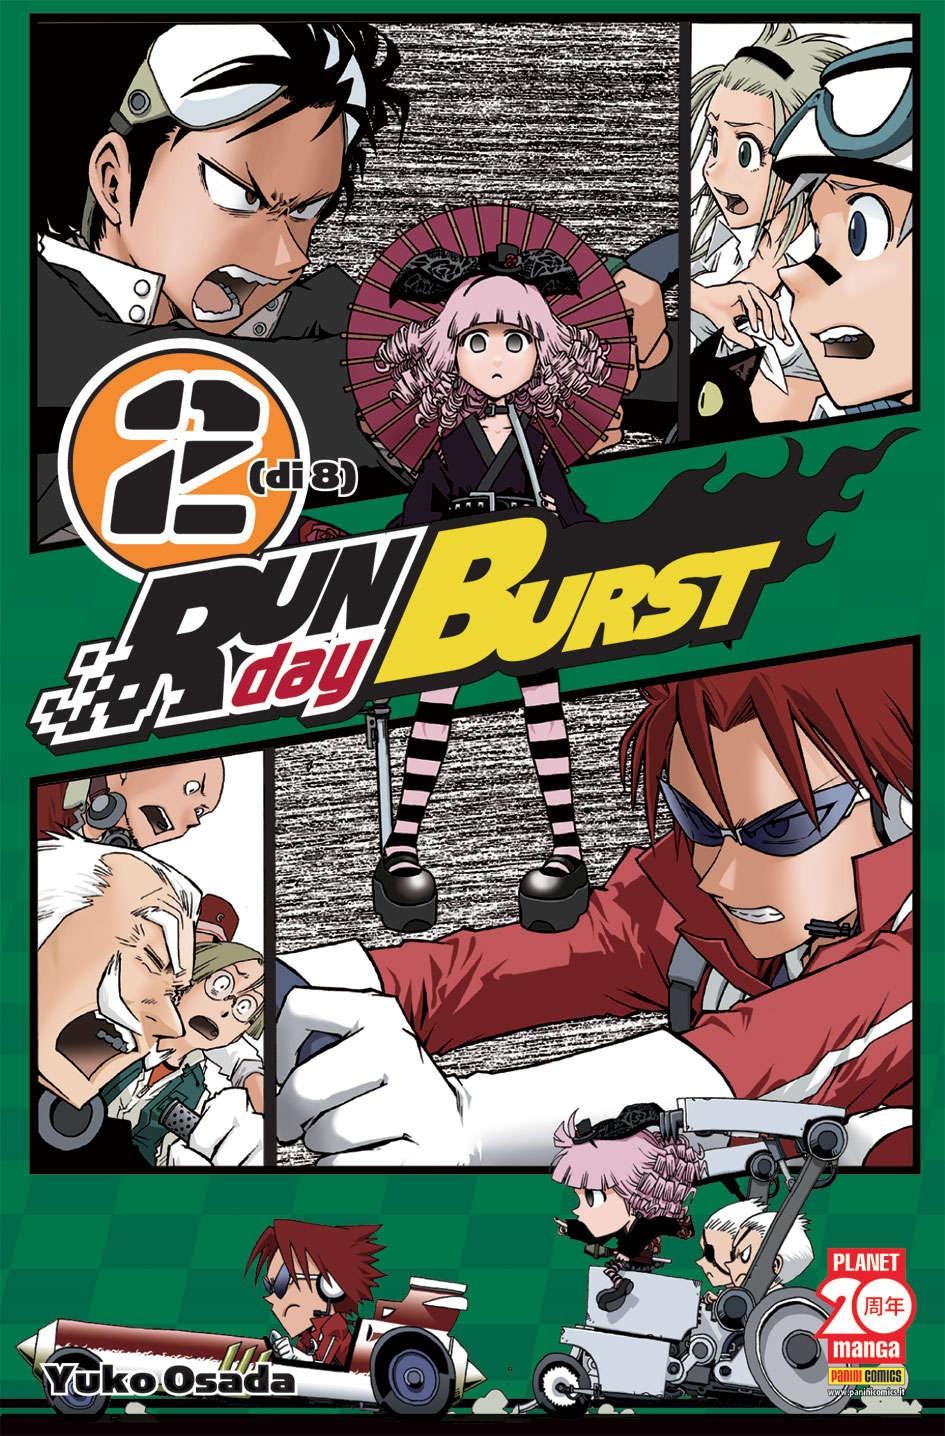 Run Day Burst - N° 2 - Run Day Burst (M8) - Planet Manga